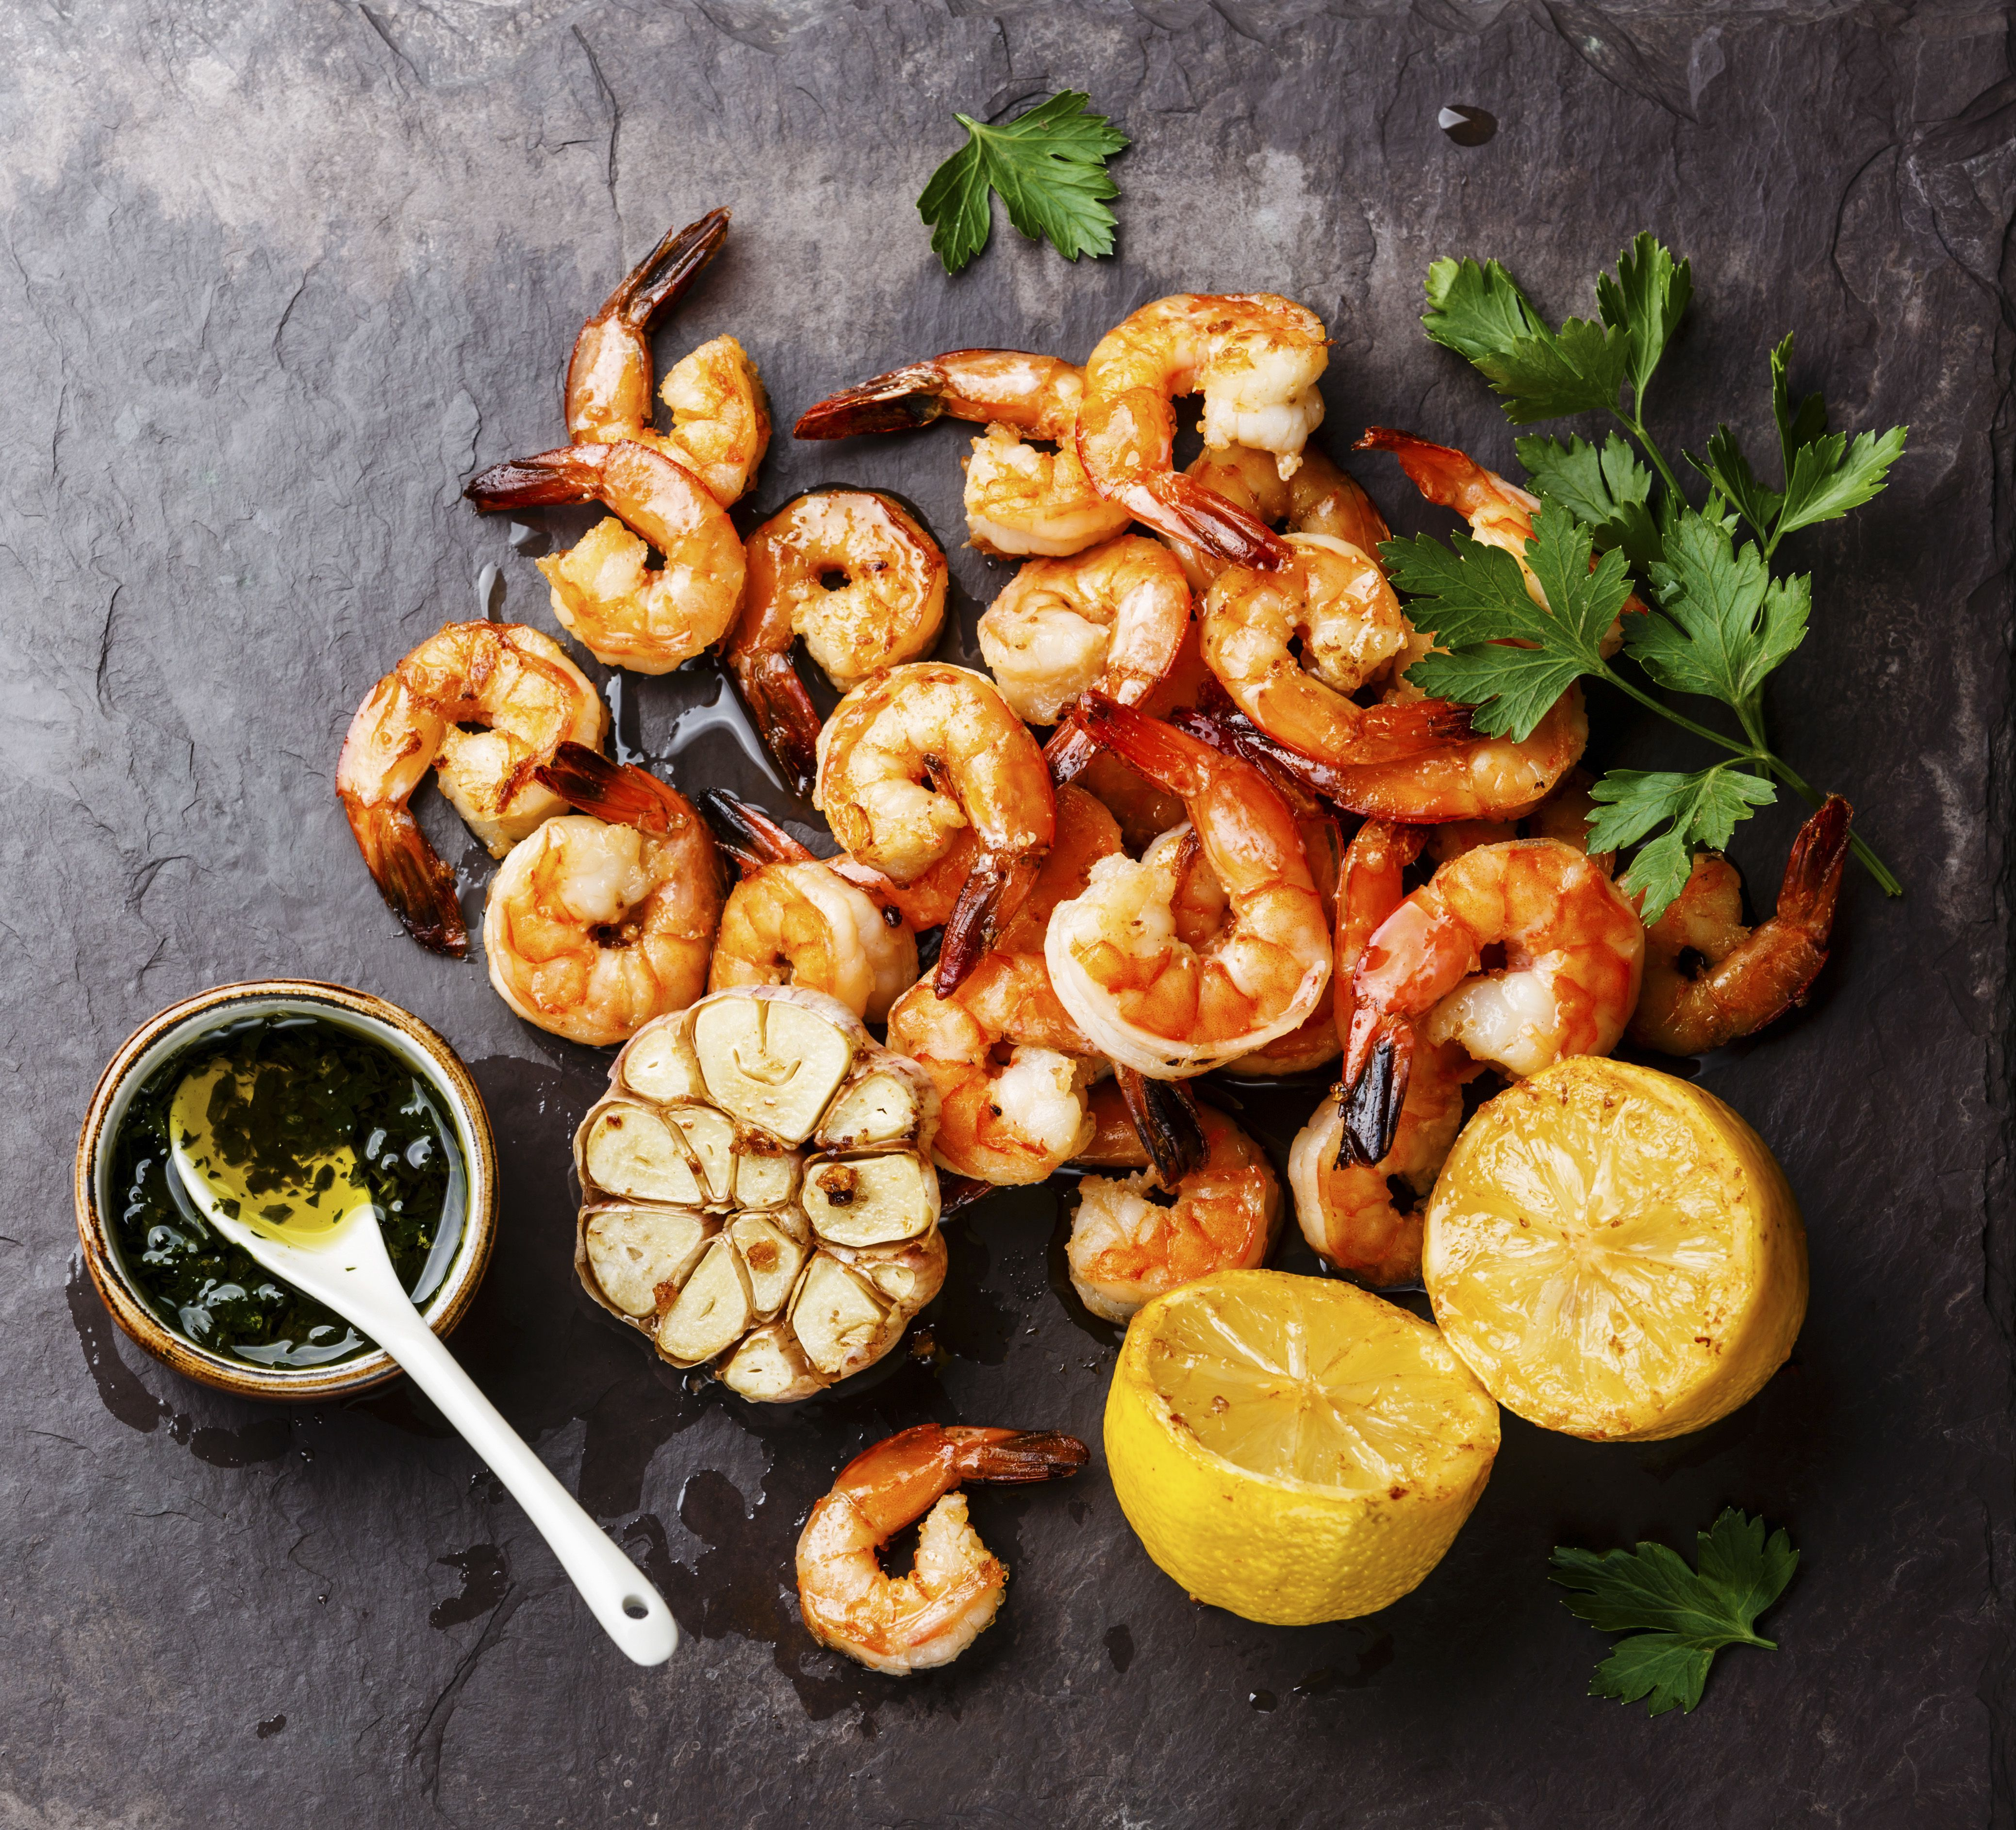 Prawns Shrimps roasted and served on stone slate with lemon and garlic close up